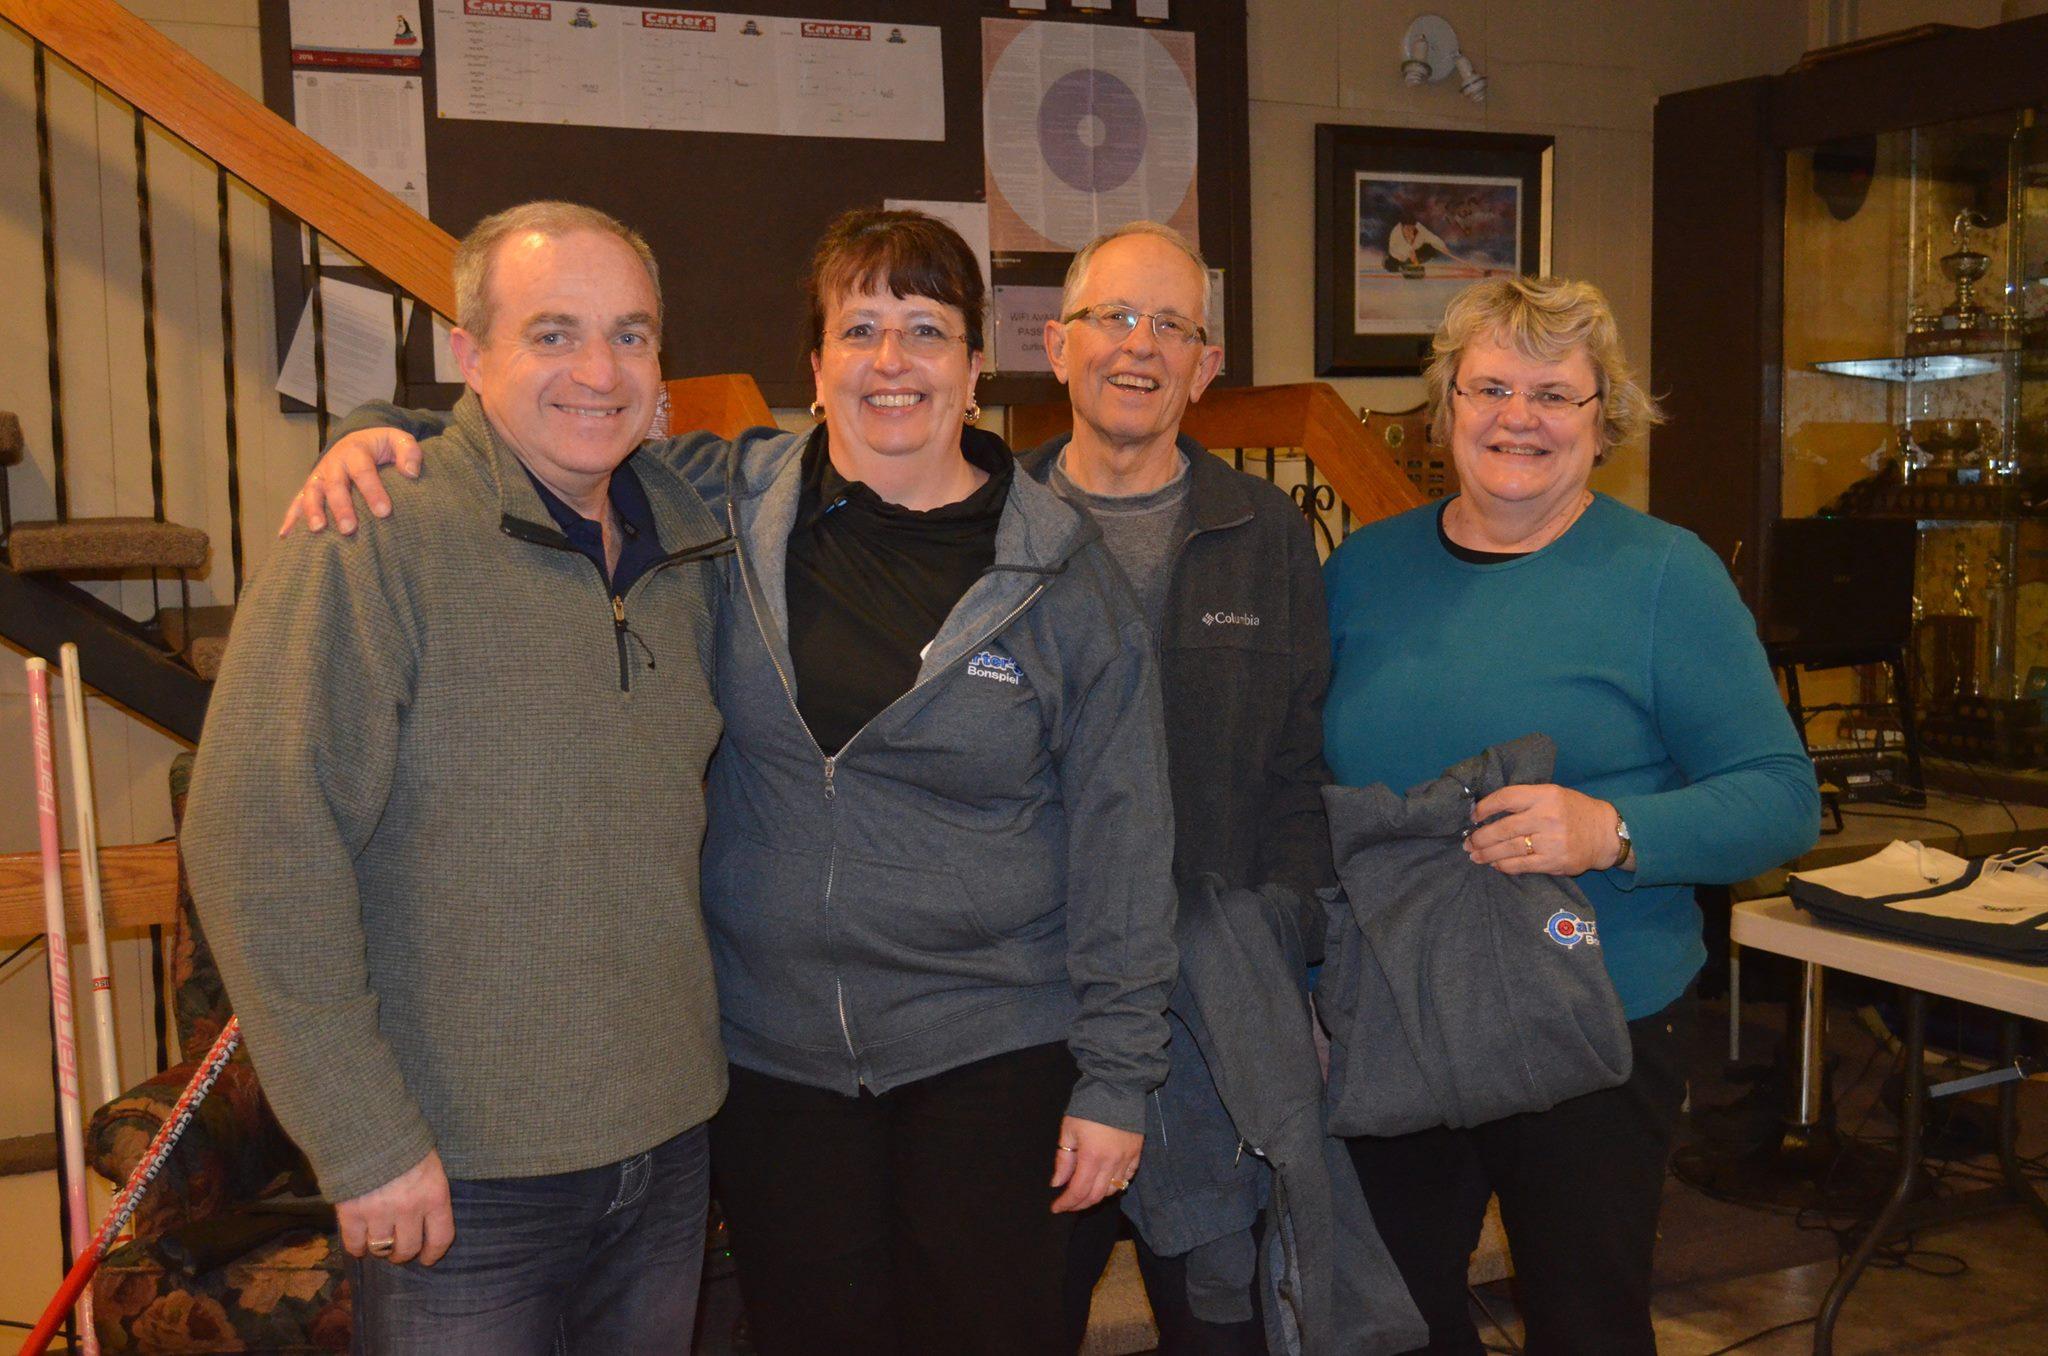 Carter's Sports Cresting Bonspiel 2016 - 1st Runner-Up - Kathy Craib, Ed Gogan, Rob LeMoine, Cindy Cameron